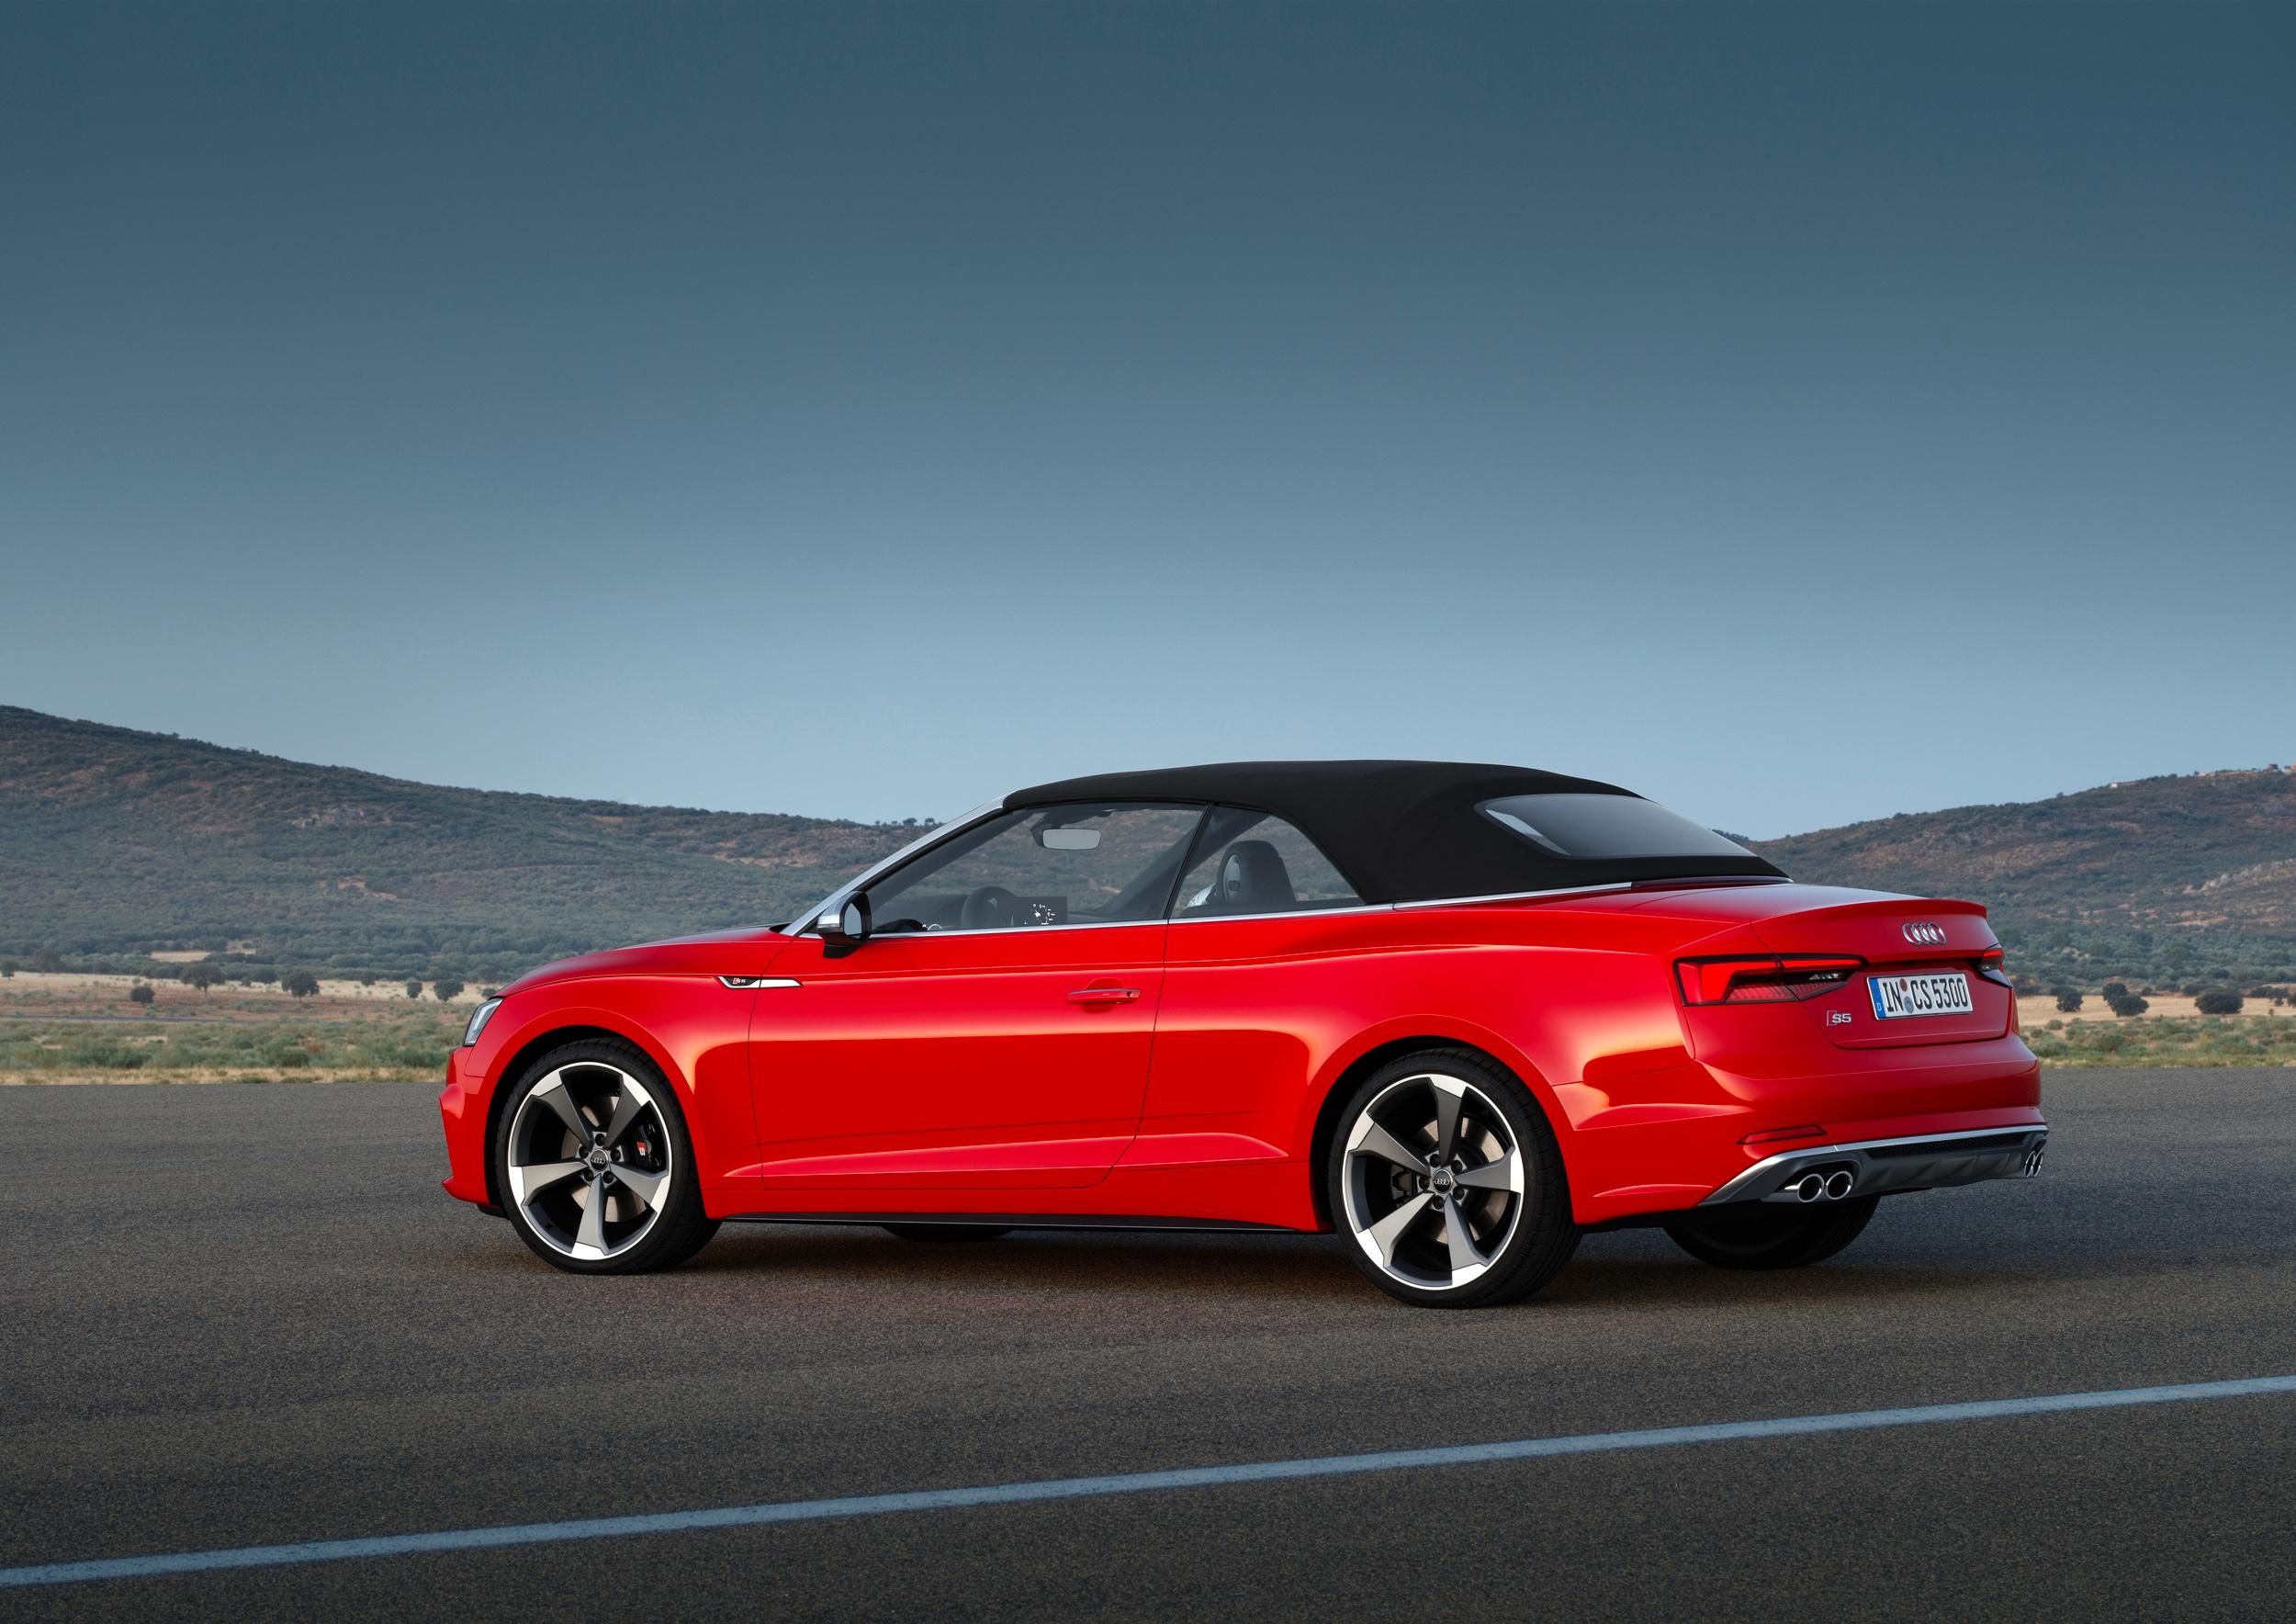 Audi A5 Cabriolet - Audi S5 Cabriolet -3- Autovisie.nl